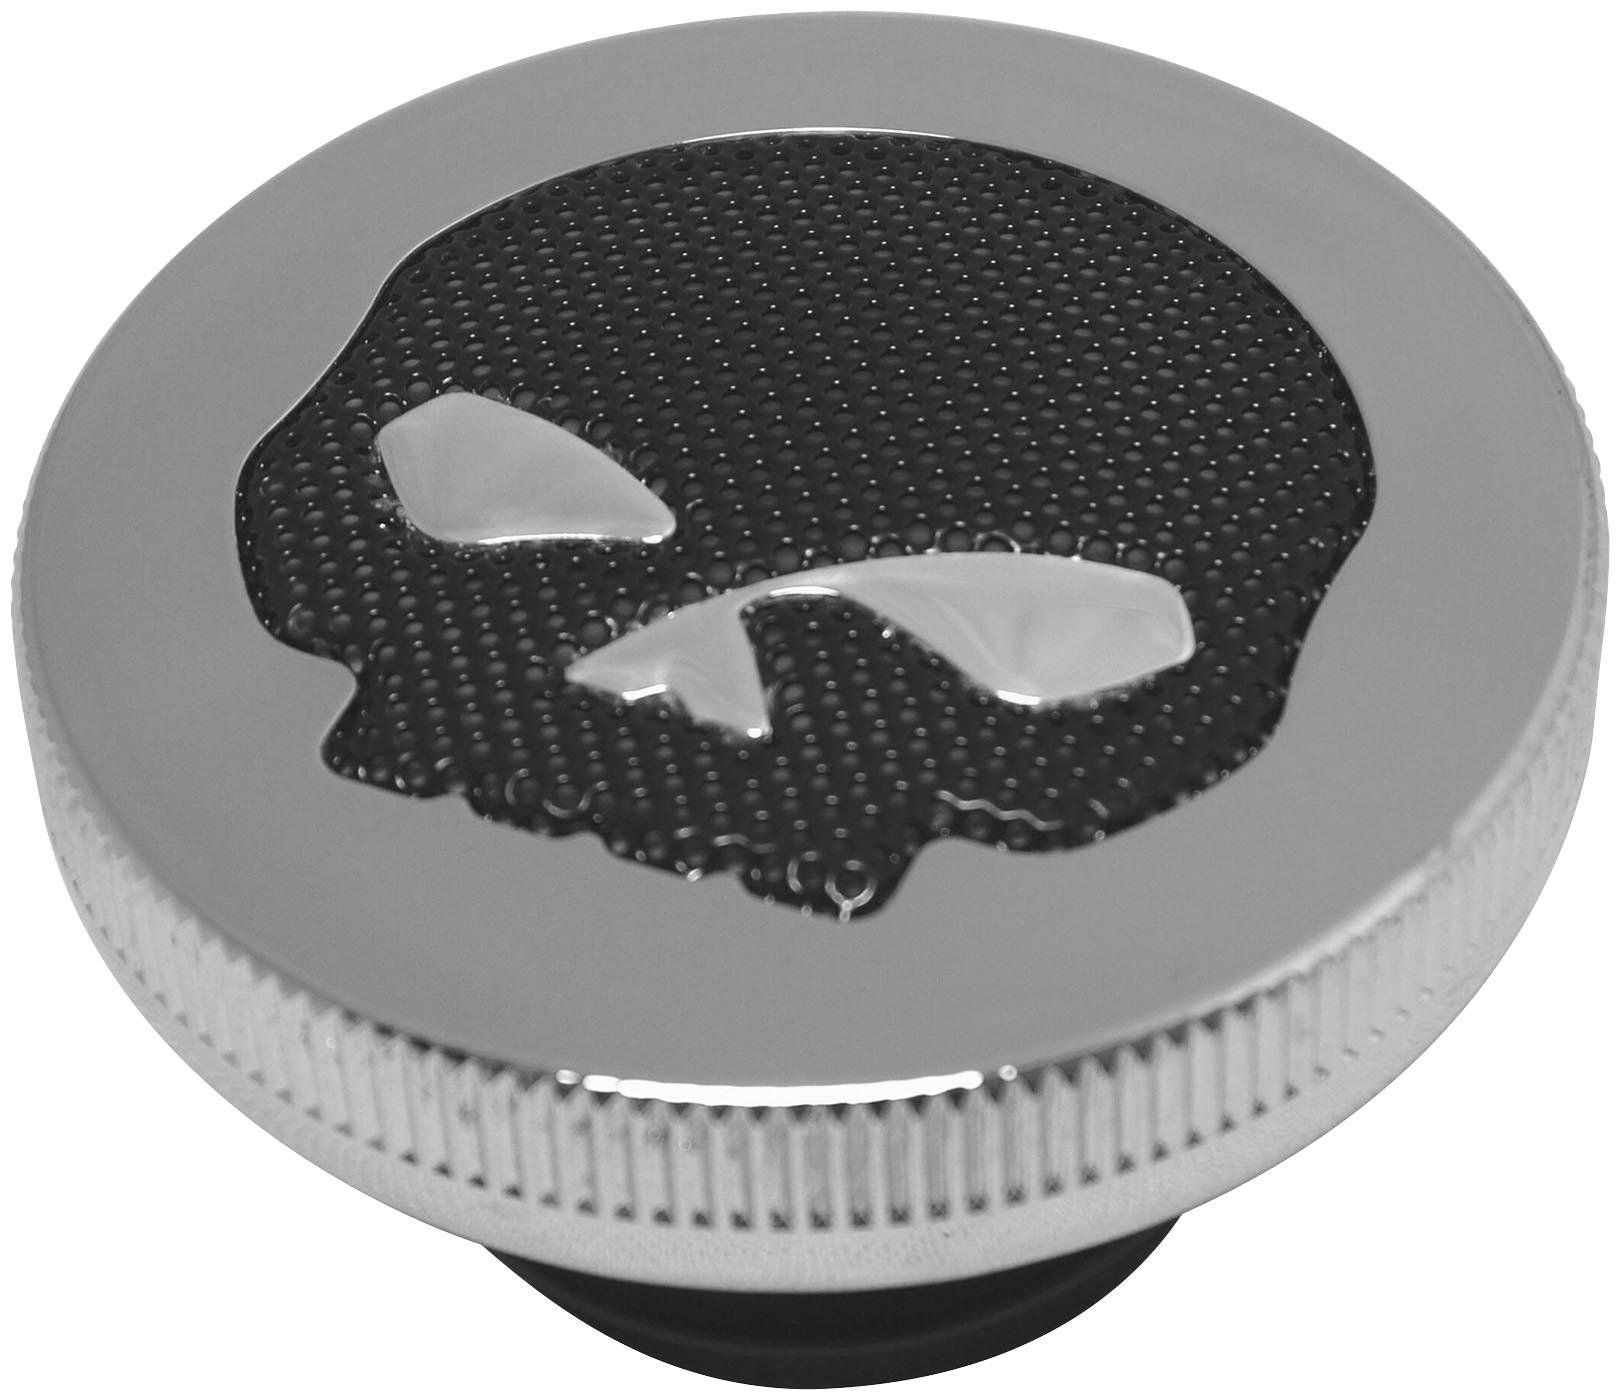 89-95 HARLEY FLHTCU: Biker's Choice Gas Cap With Skull Screen